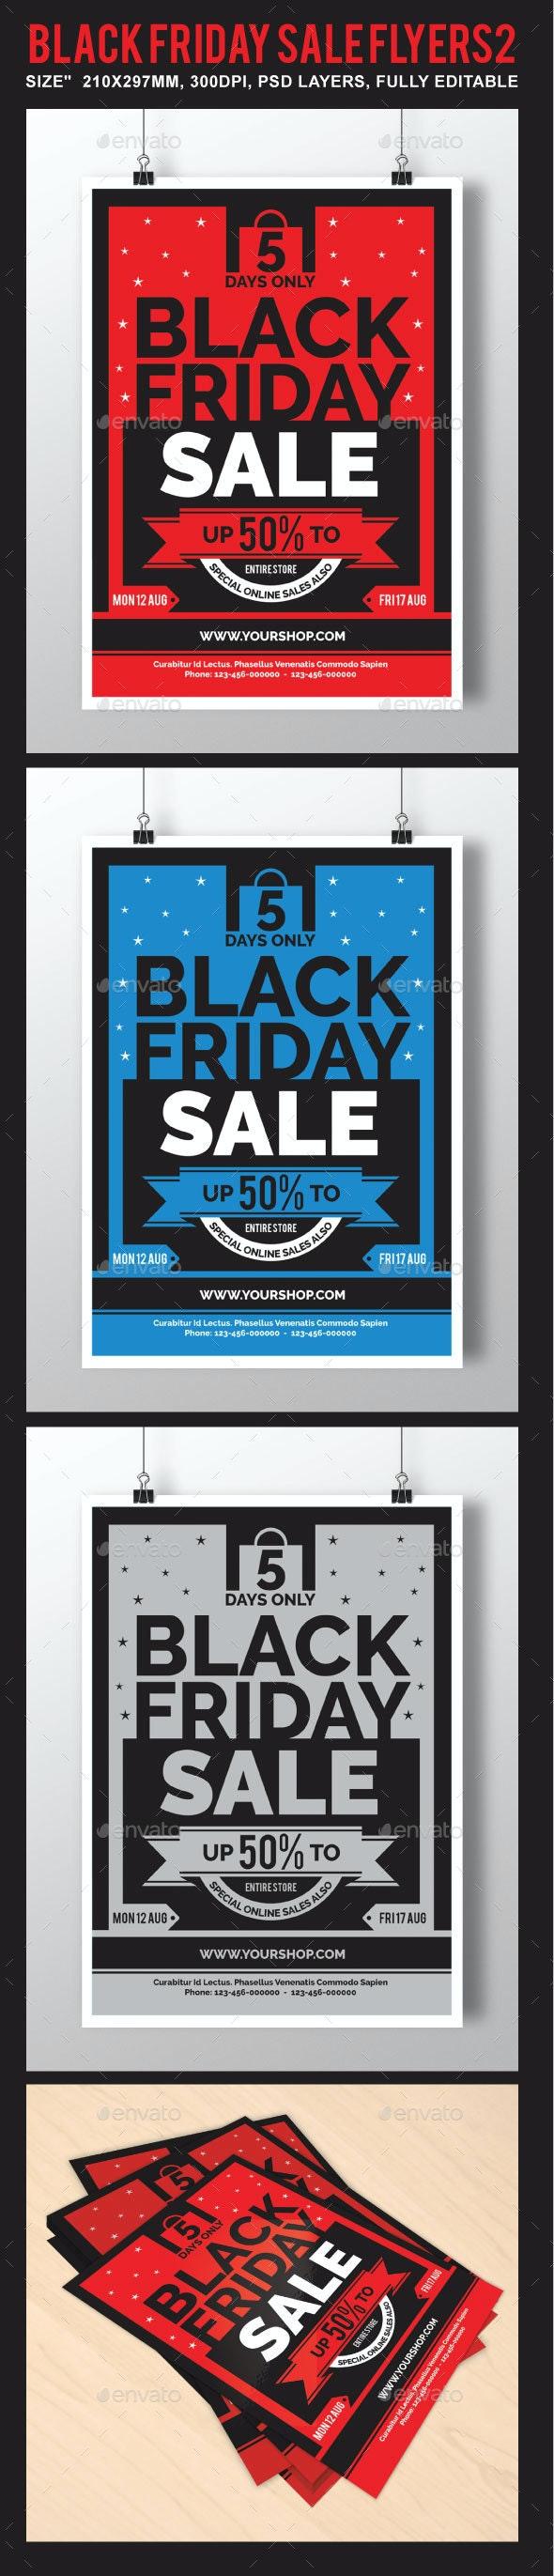 Black Friday Sale Flyer 2 - Holidays Events